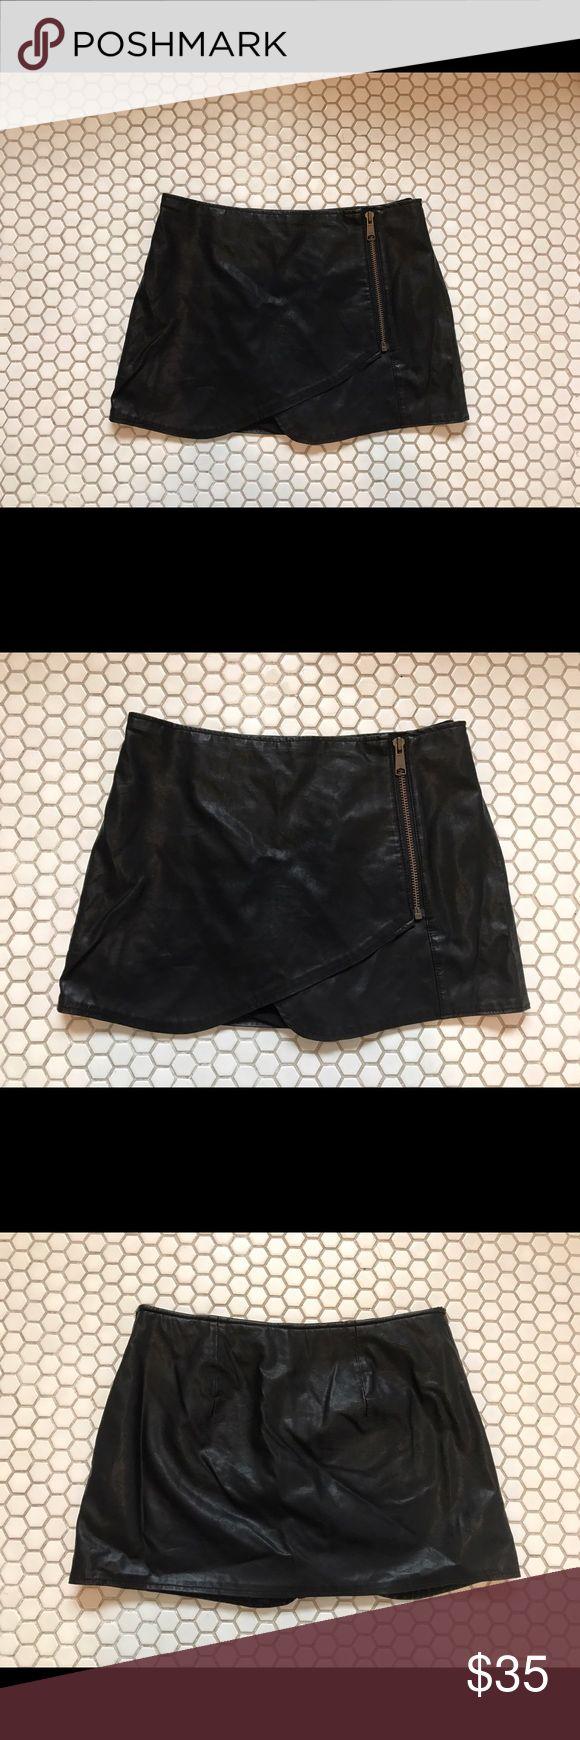 FREE PEOPLE vegan leather  (skort) ♠️♠️♠️ Free people skort ♠️♠️♠️ 100% polyurethane, rayon/ spandex / elastane shorts inside - feels really amazing ♠️♠️♠️  size 2 Free People Skirts Mini